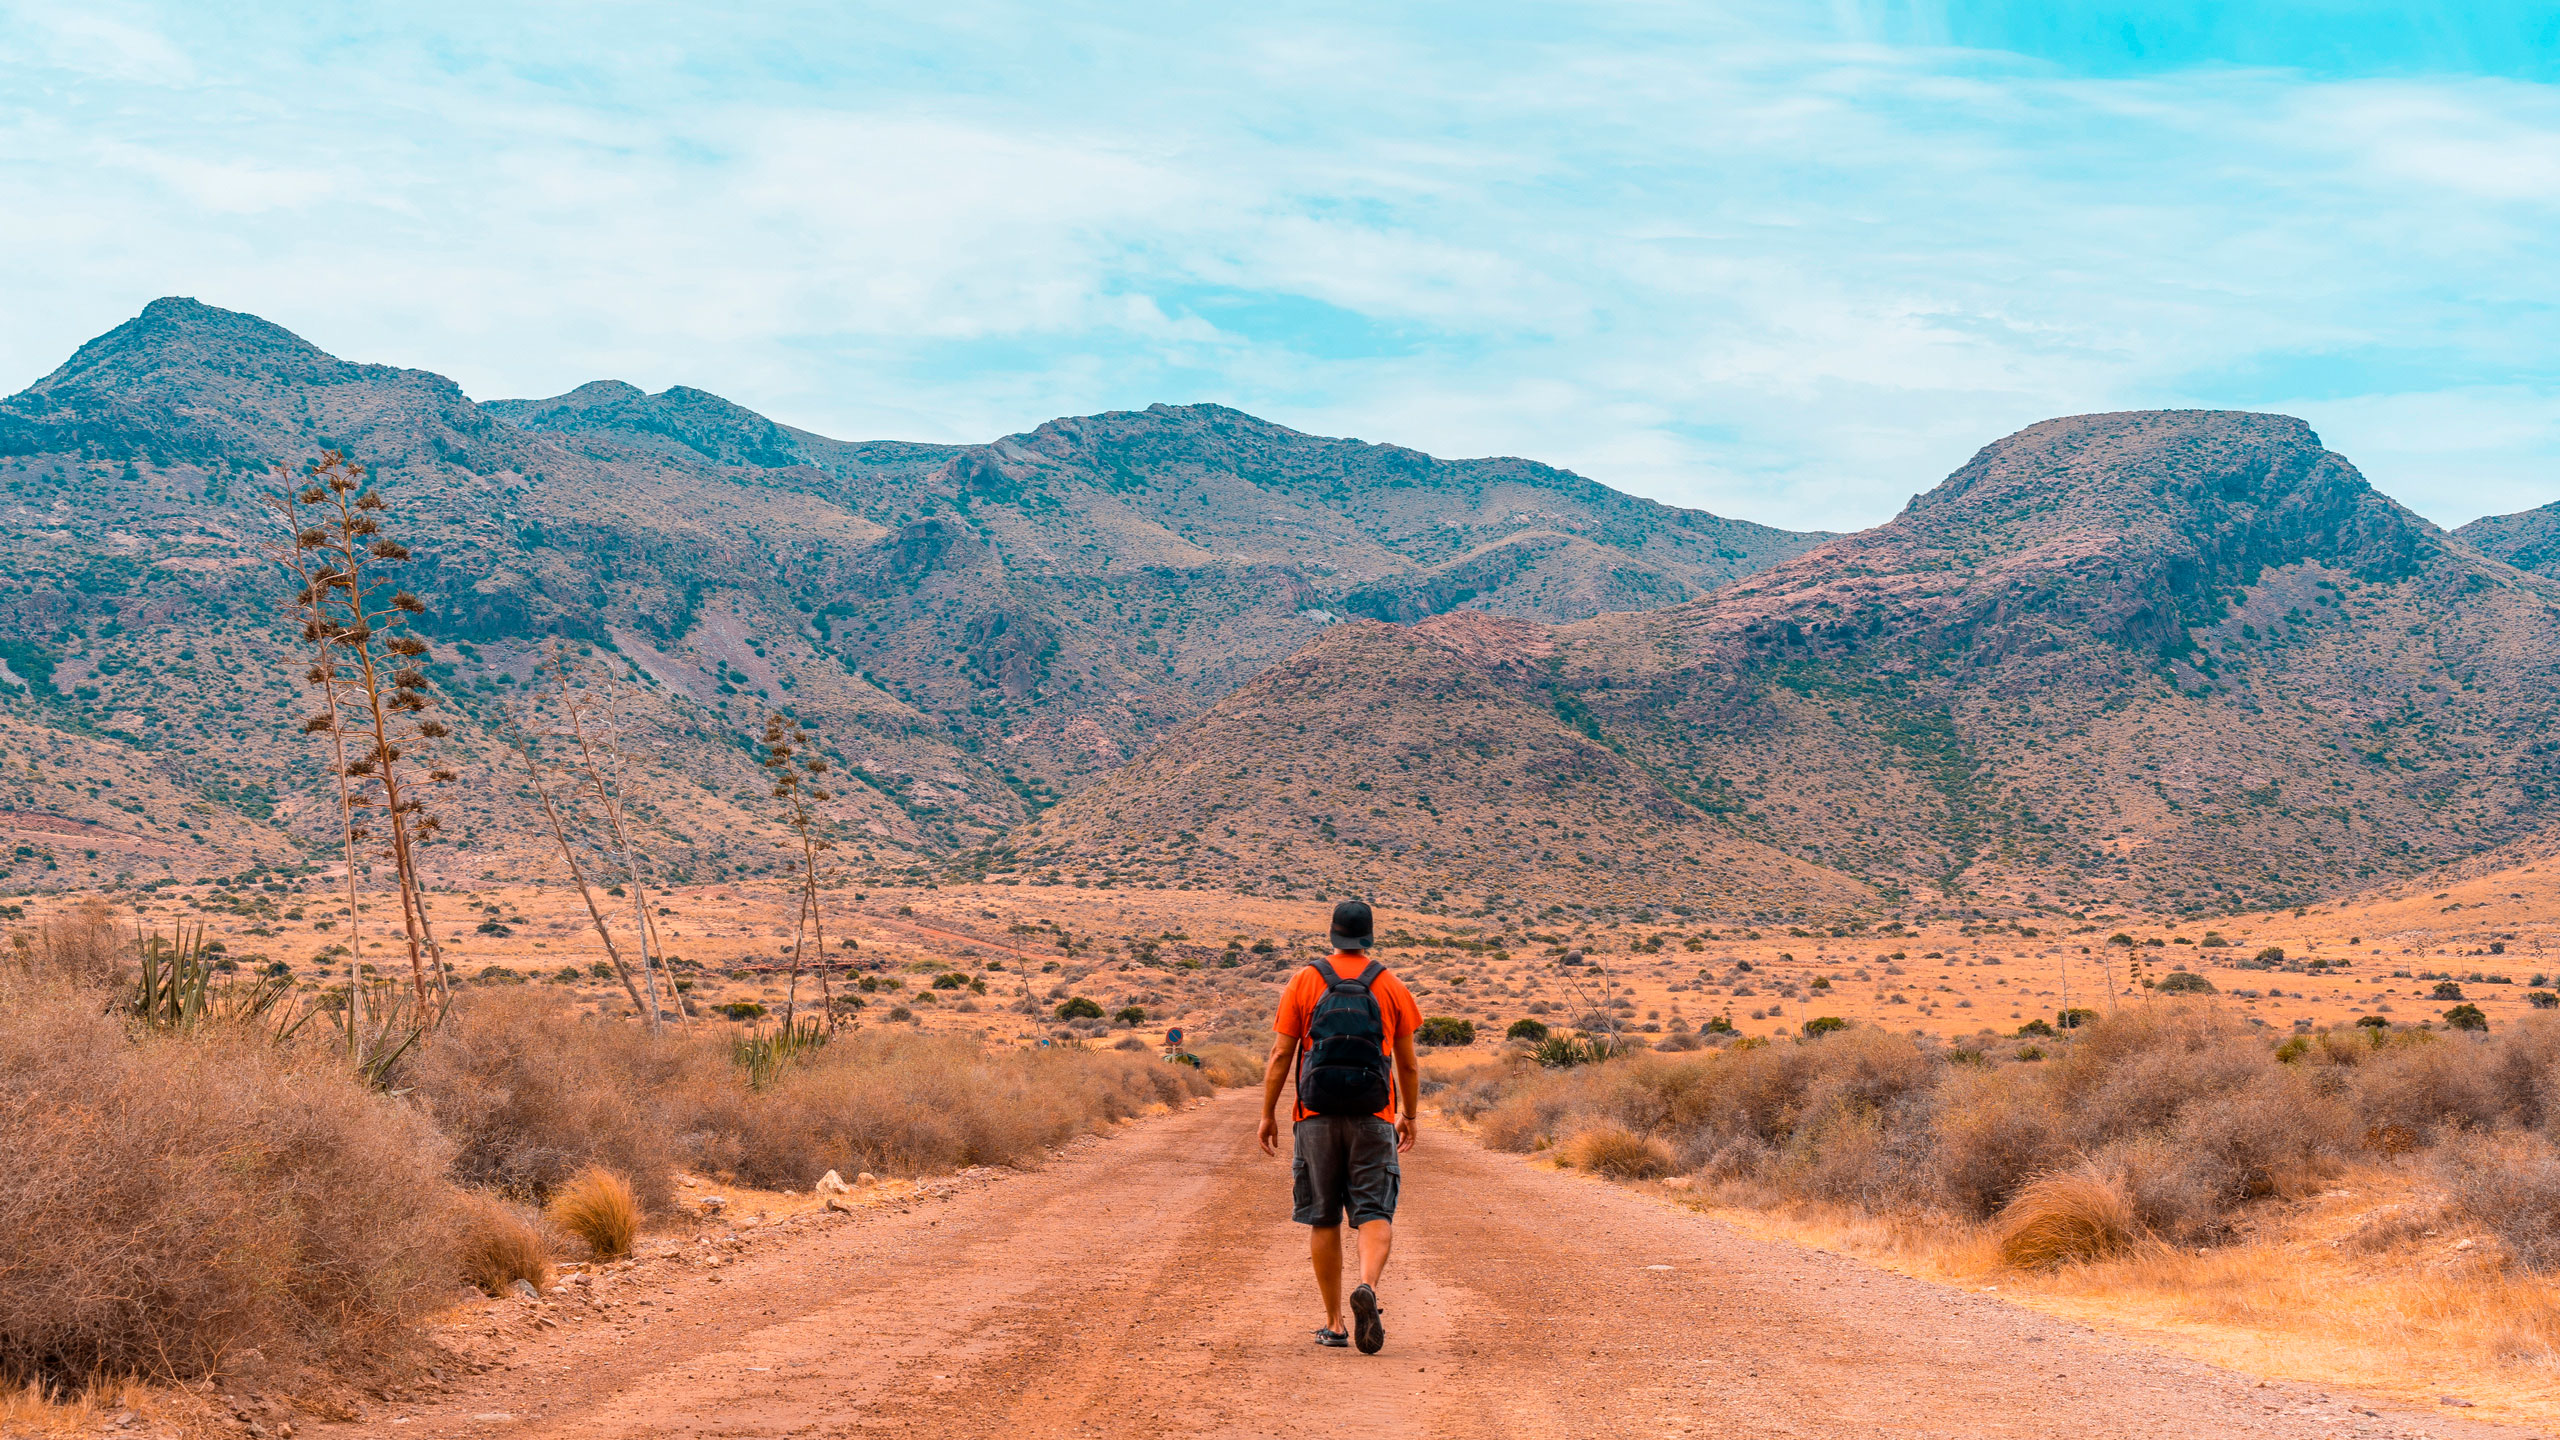 Walking man in Cabo de Gata-Nijar